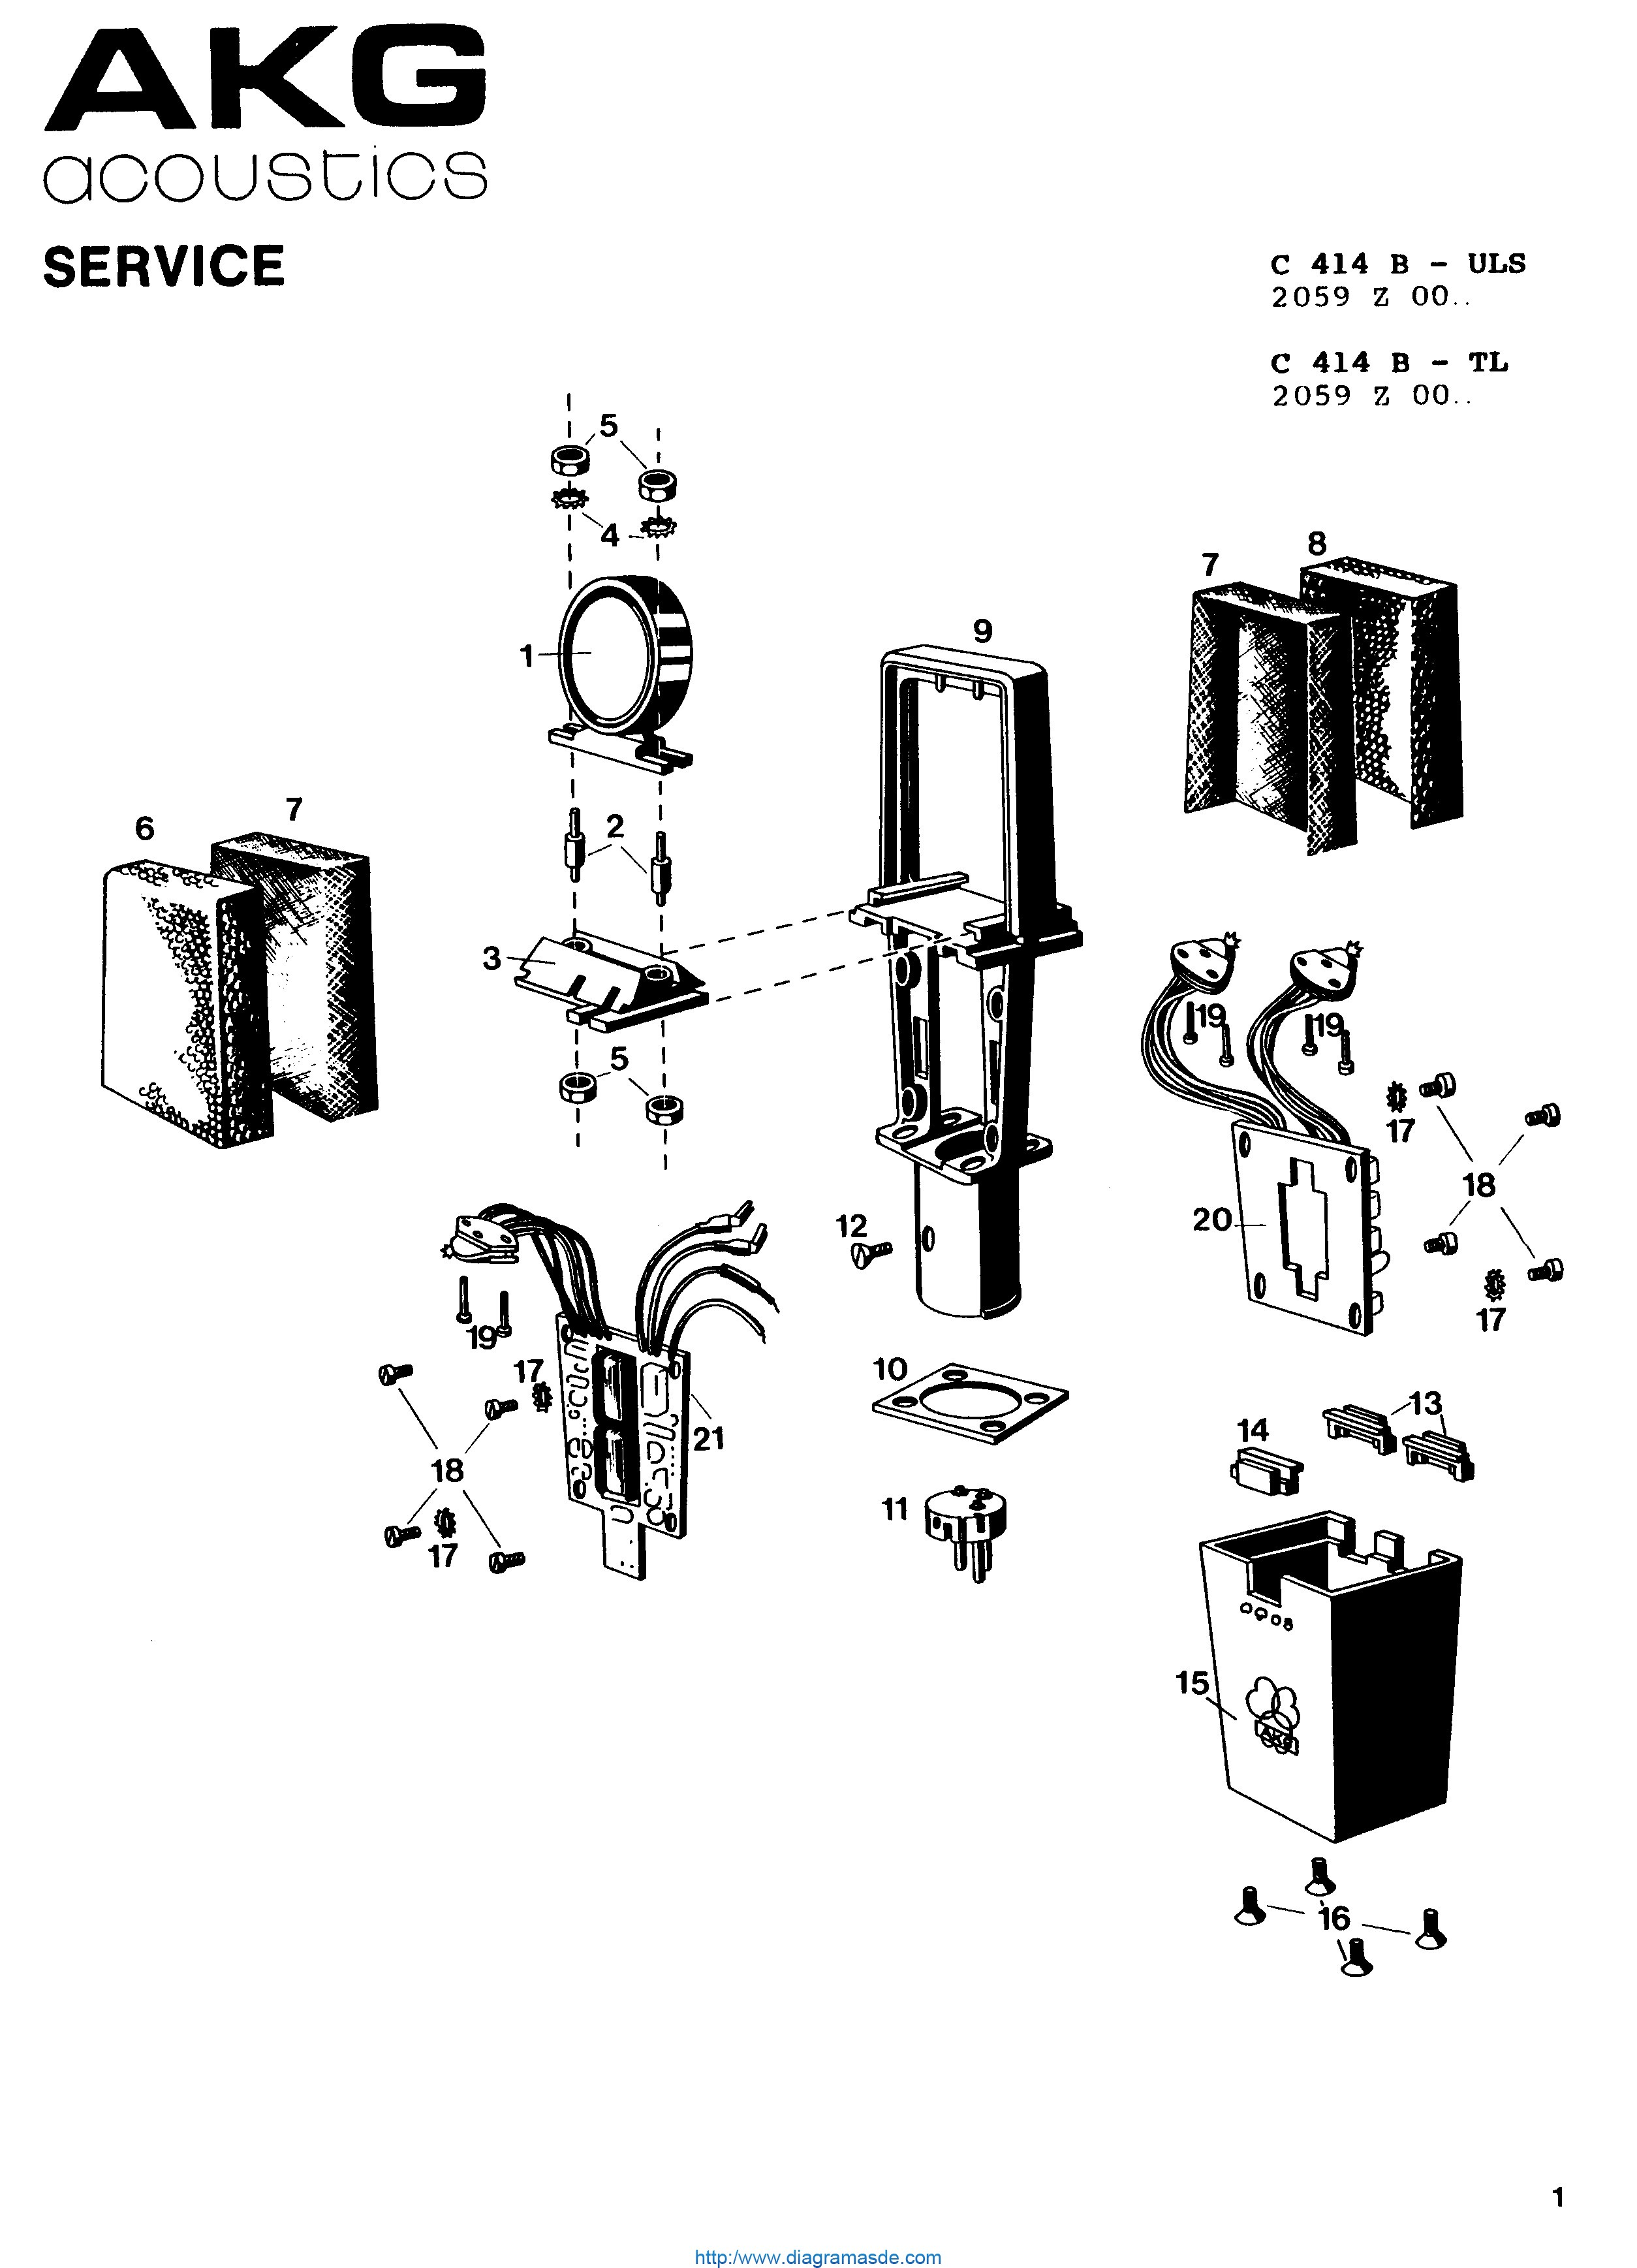 AKG-c414B ULS.pdf